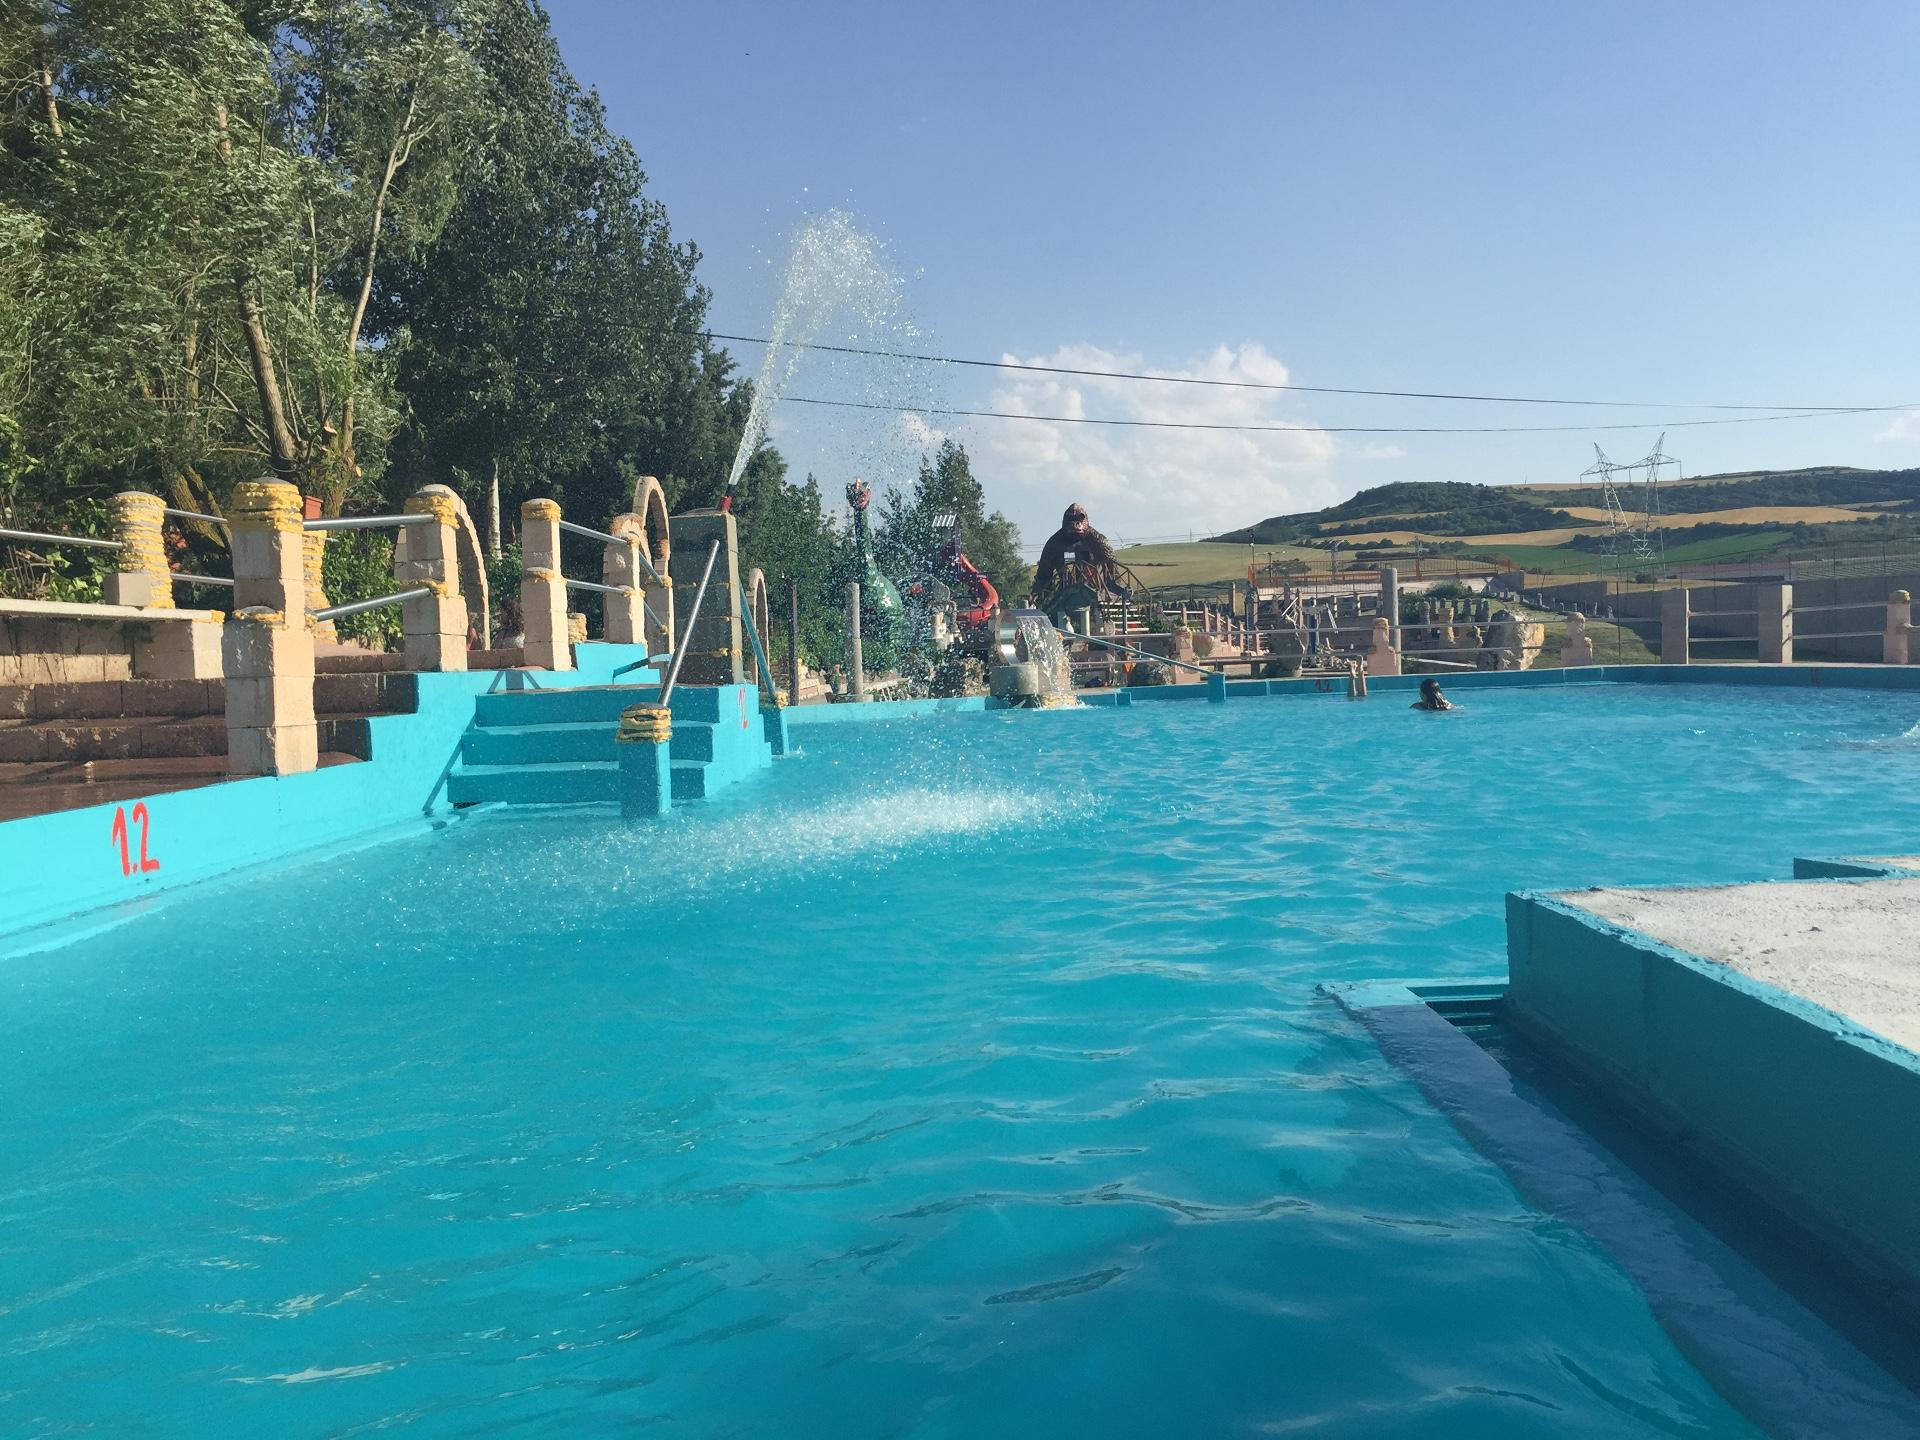 Piscinas camping motel piscinas municipales pic n for Fotos de piscinas climatizadas